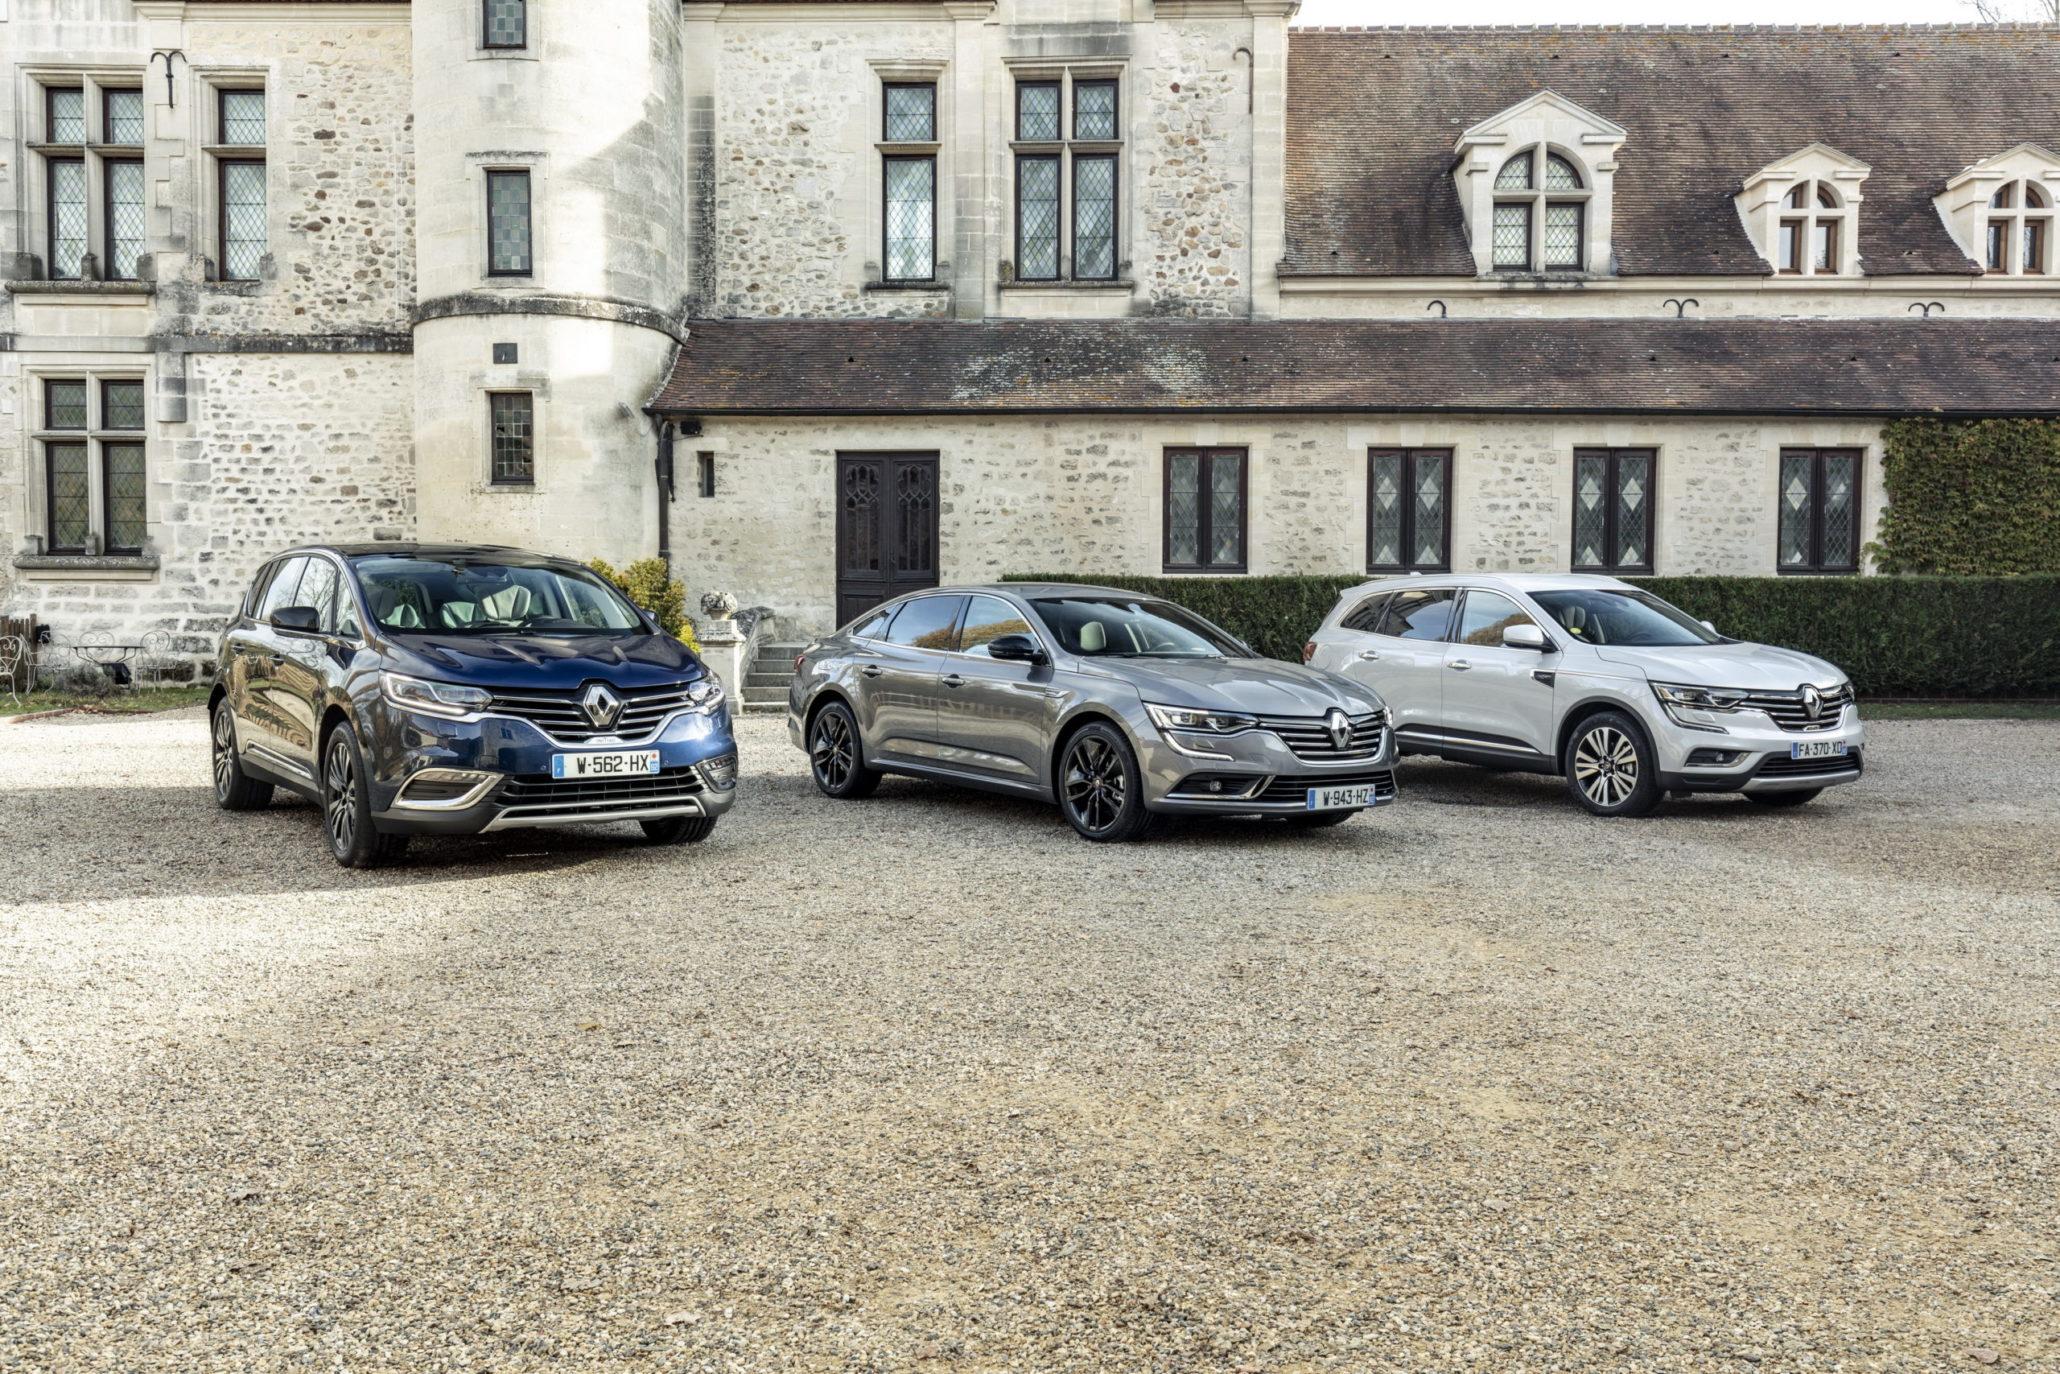 Renault Espace, Talisman, Koleos